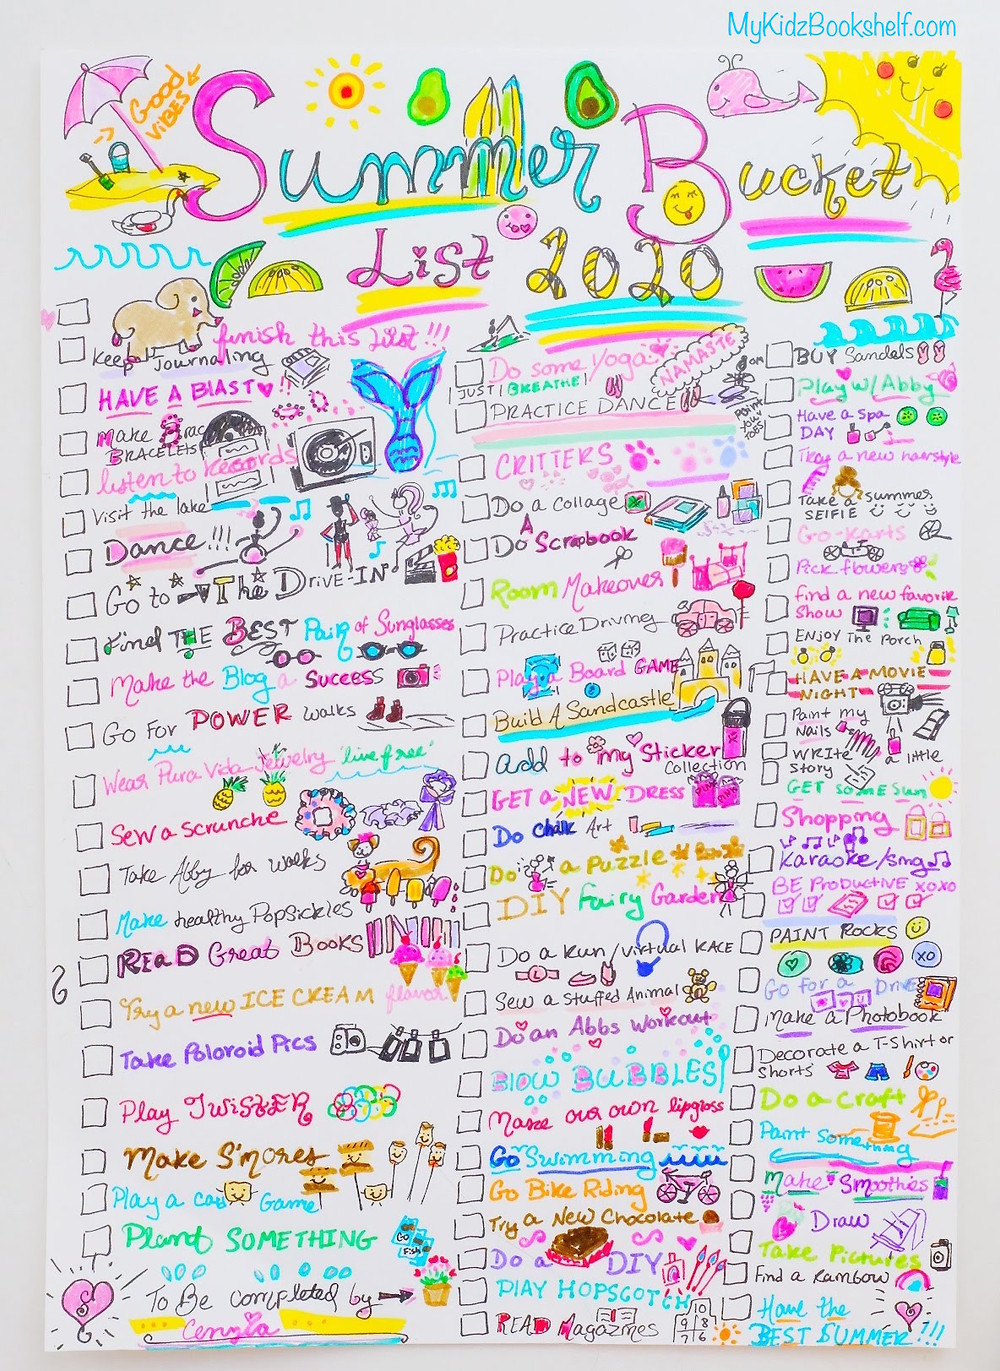 Summer Bucket List DIY ideas illustrations printable idea